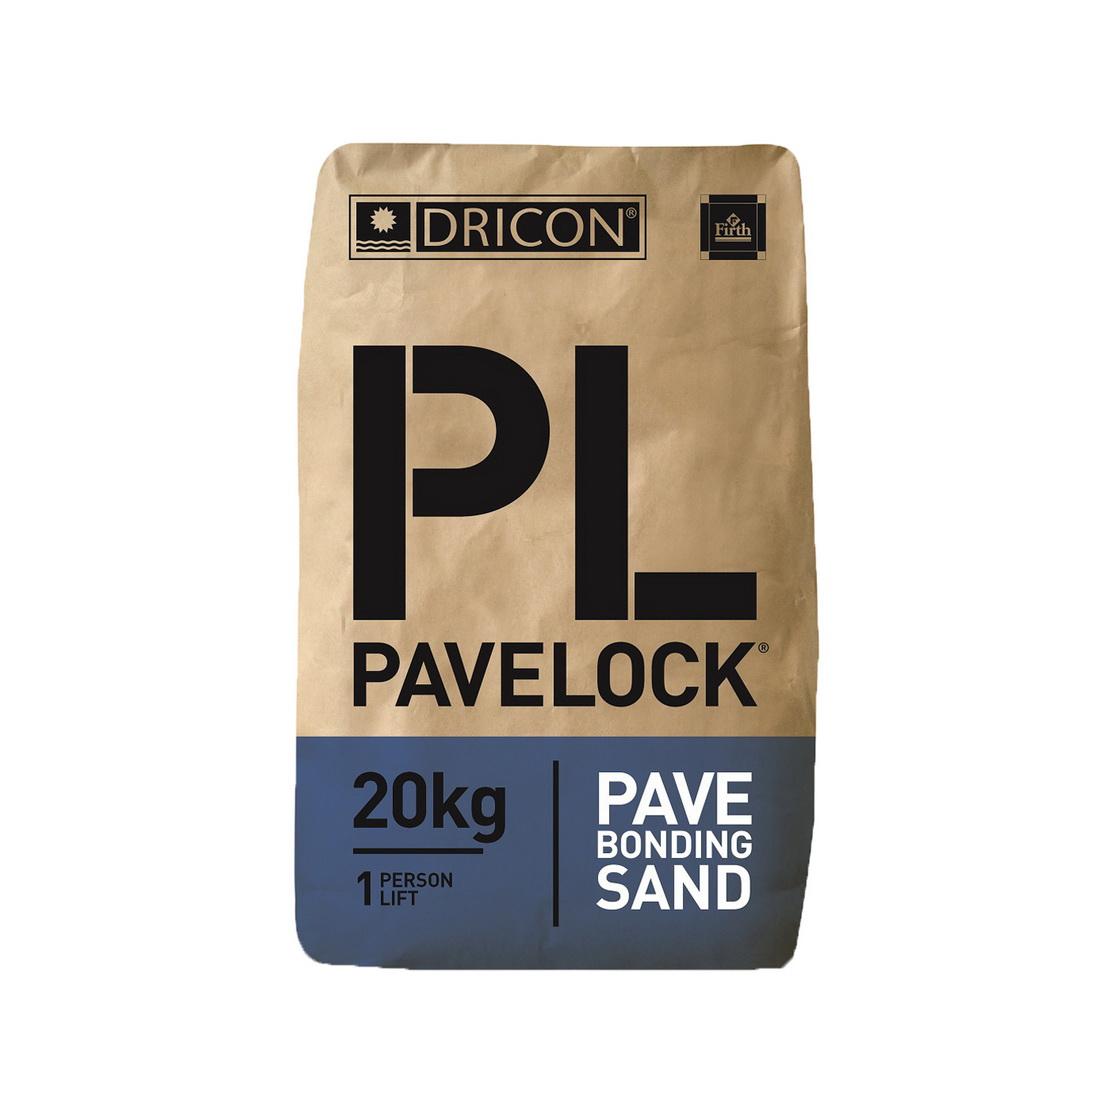 Pavelock 20kg